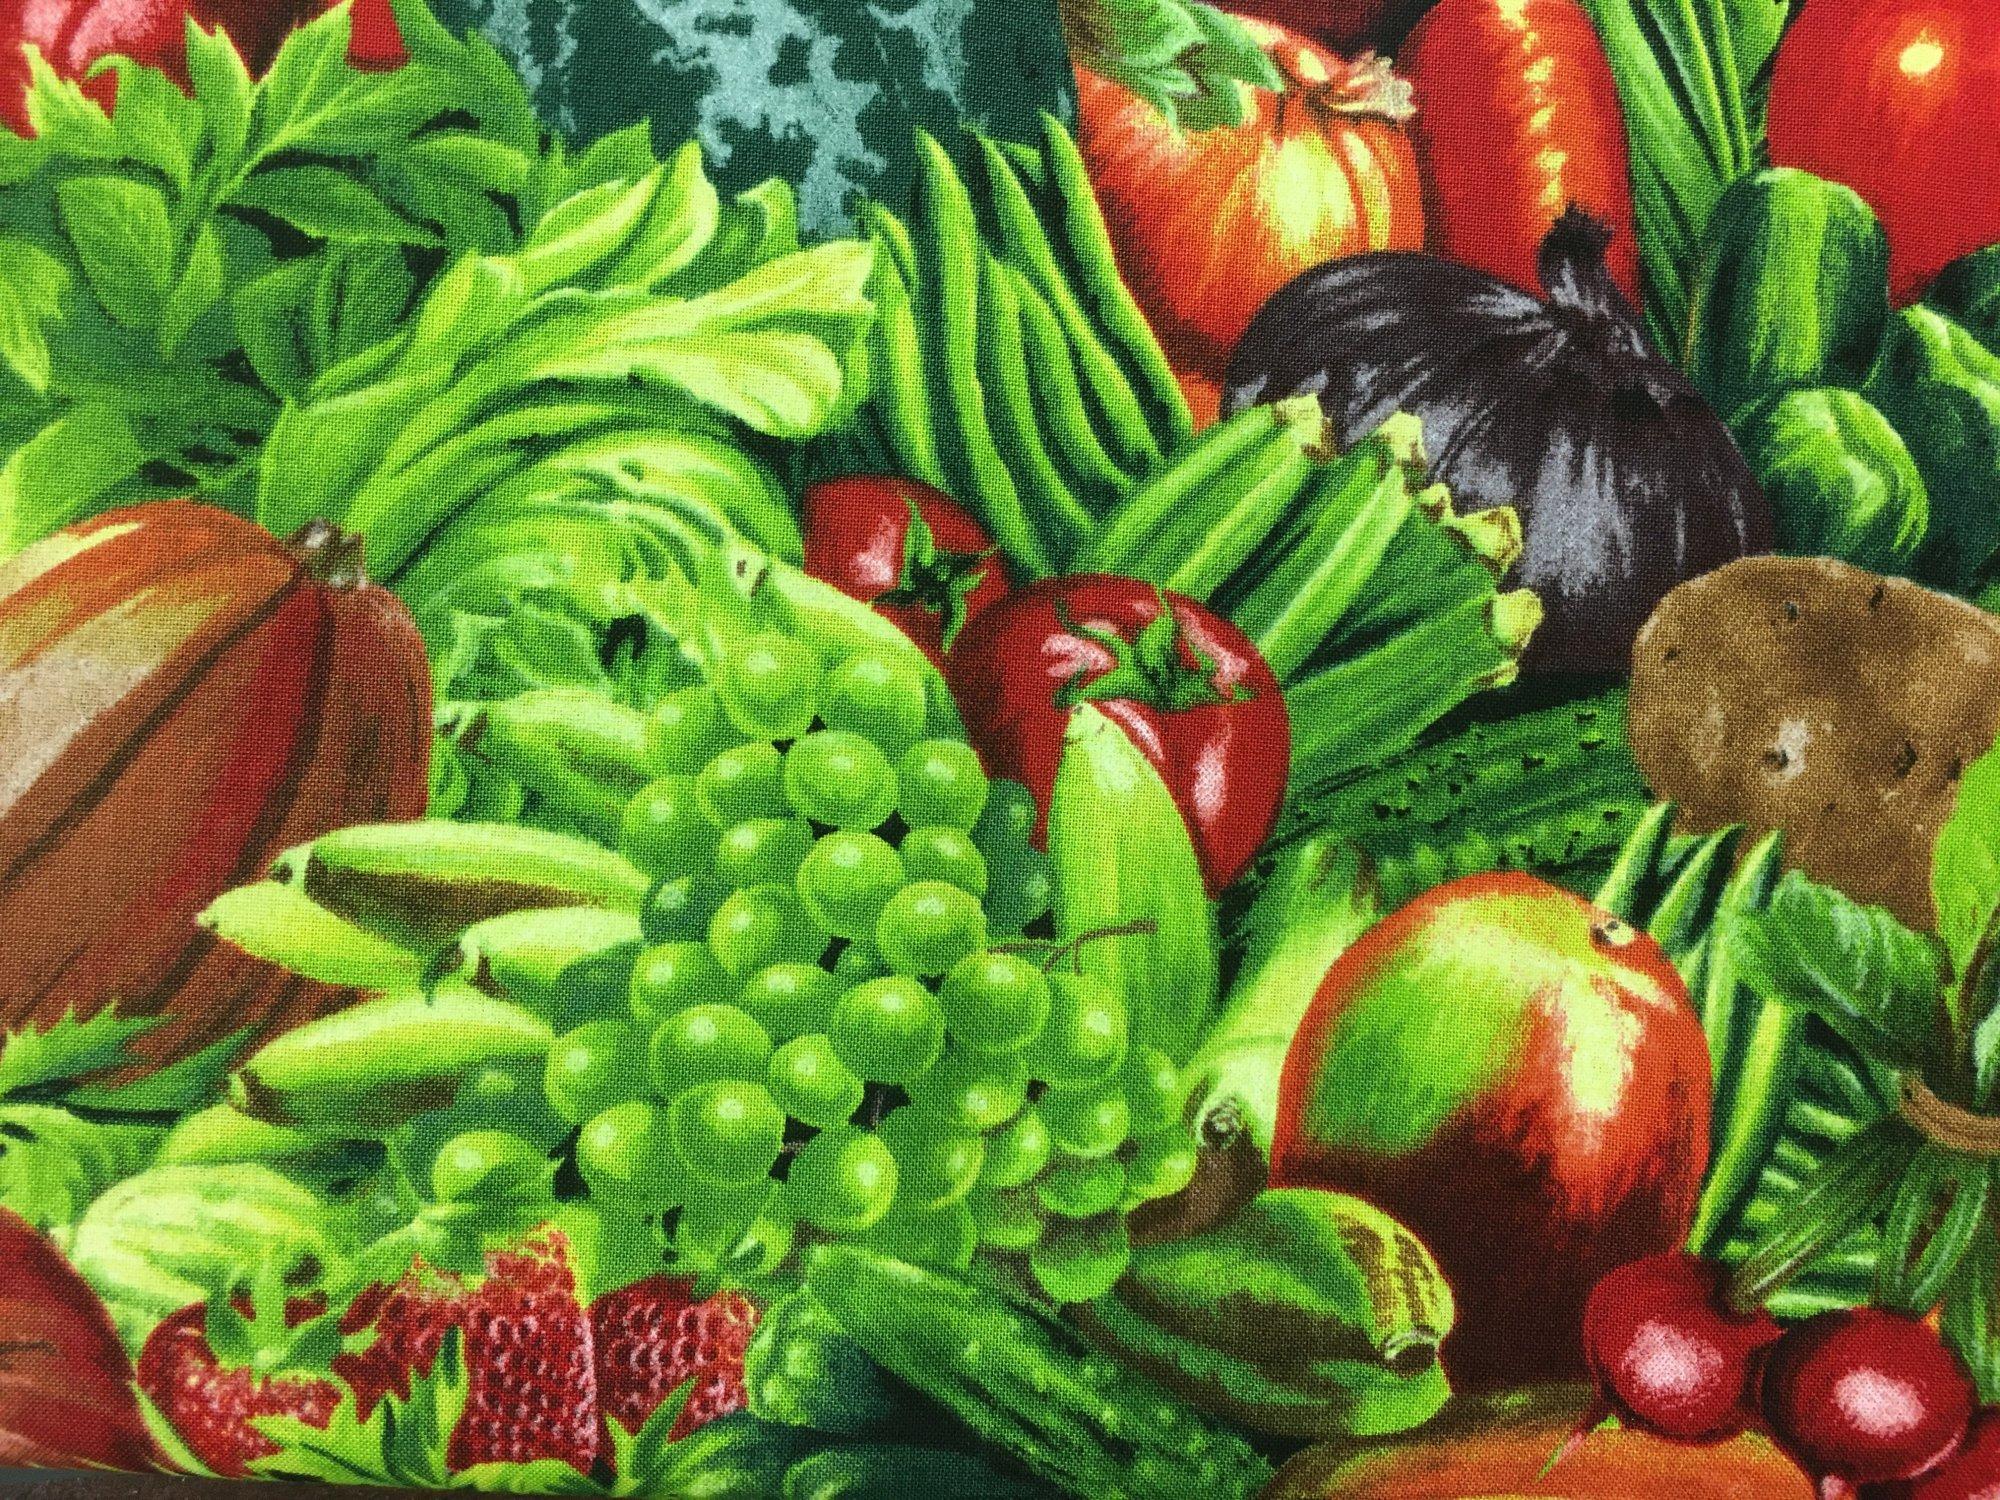 Fresh Picked Vegetables 32830 11